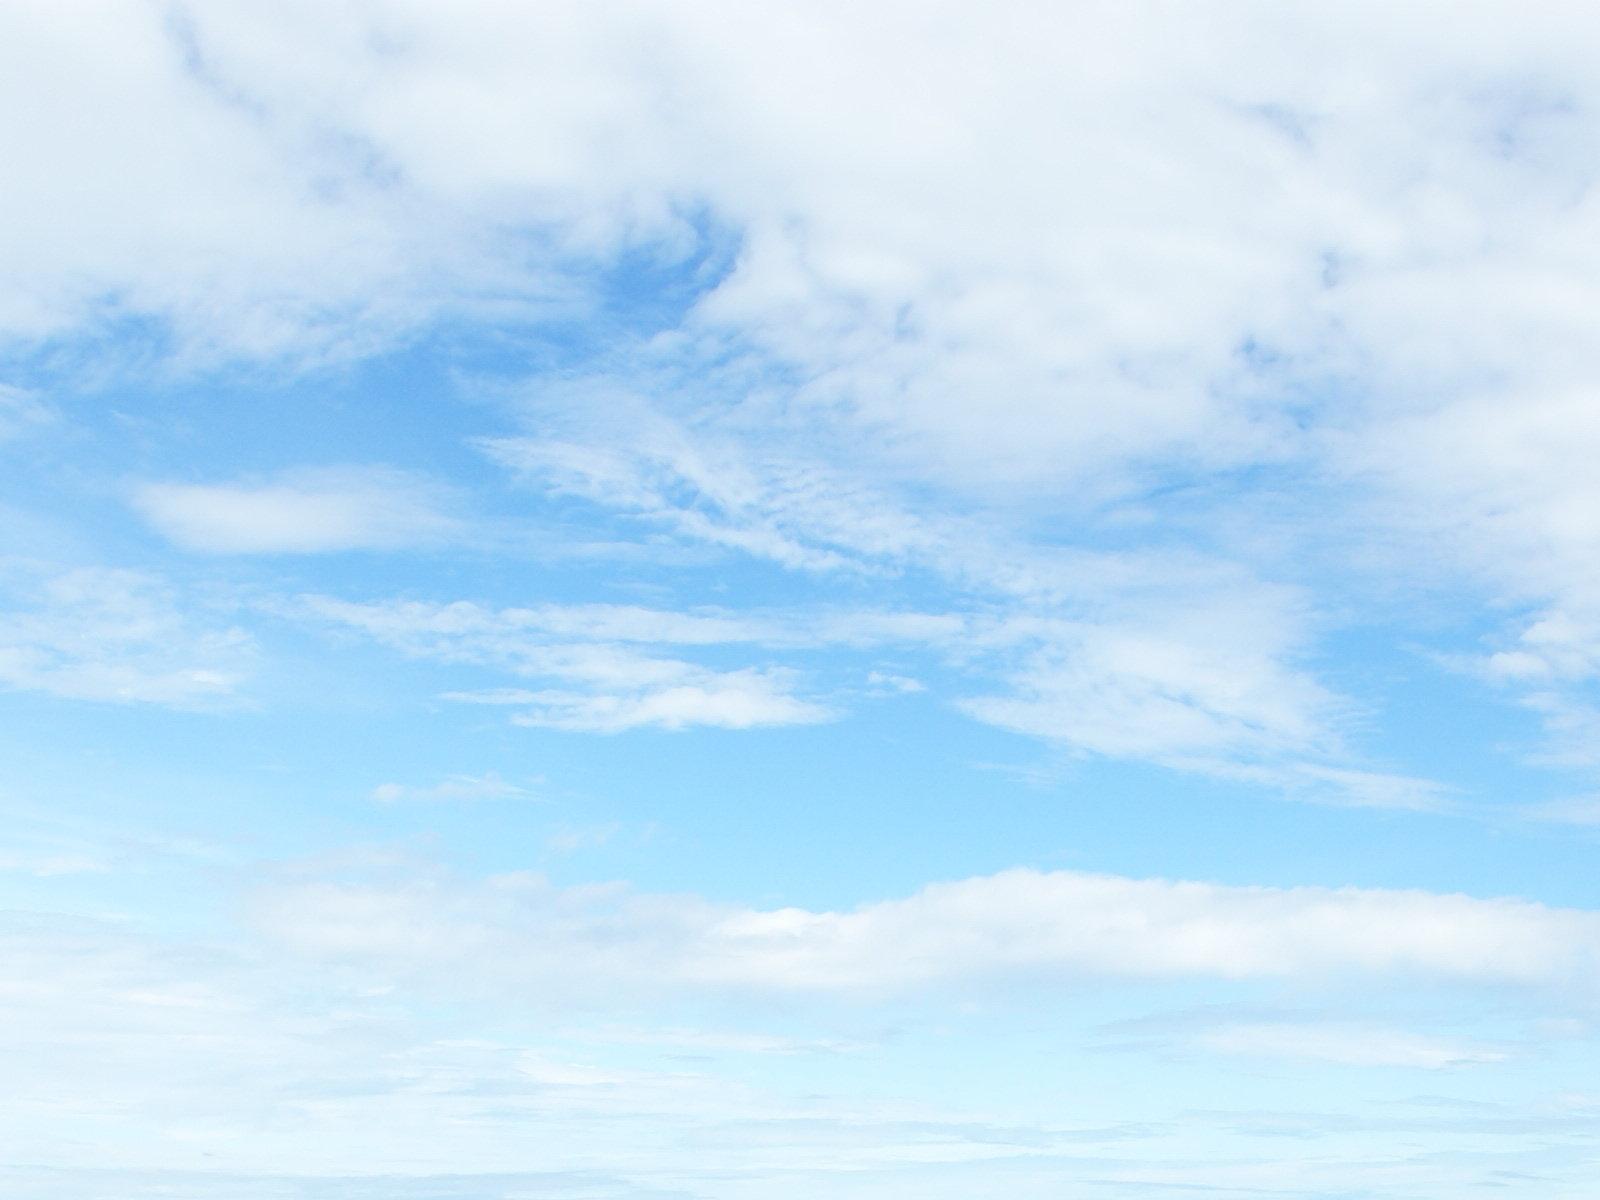 Blue sky wallpaper 1600x1200